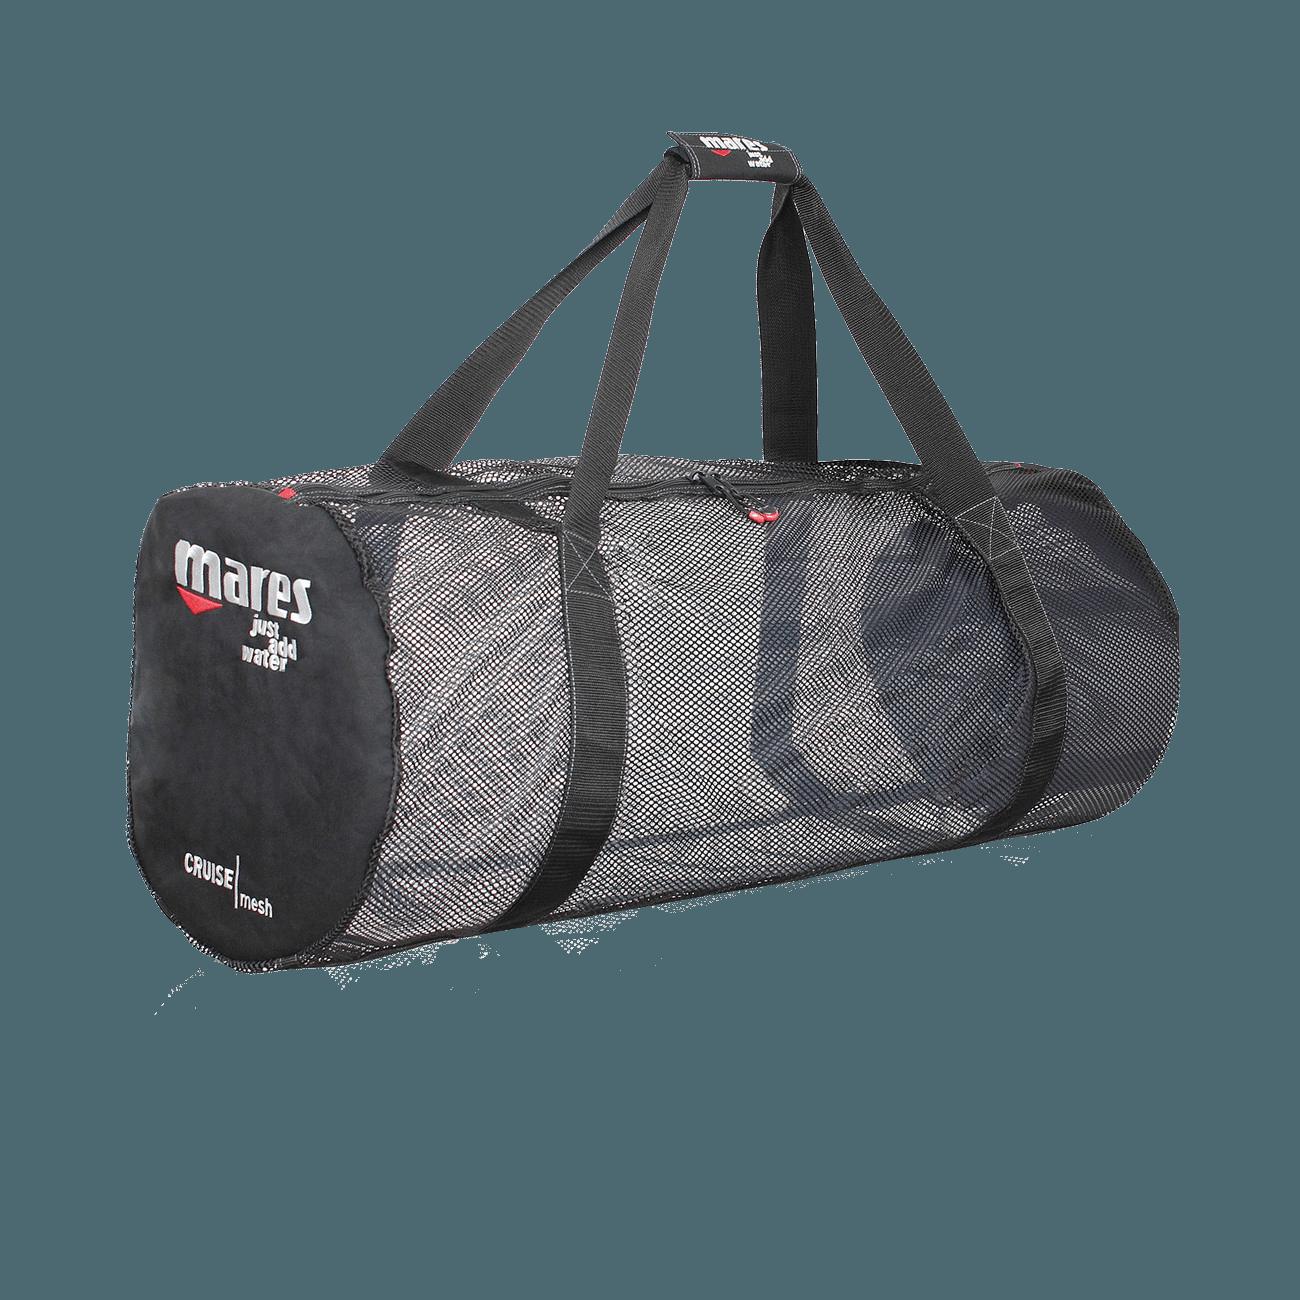 Mares Cruise Mesh Bag | Mares Bags | Mares Singapore